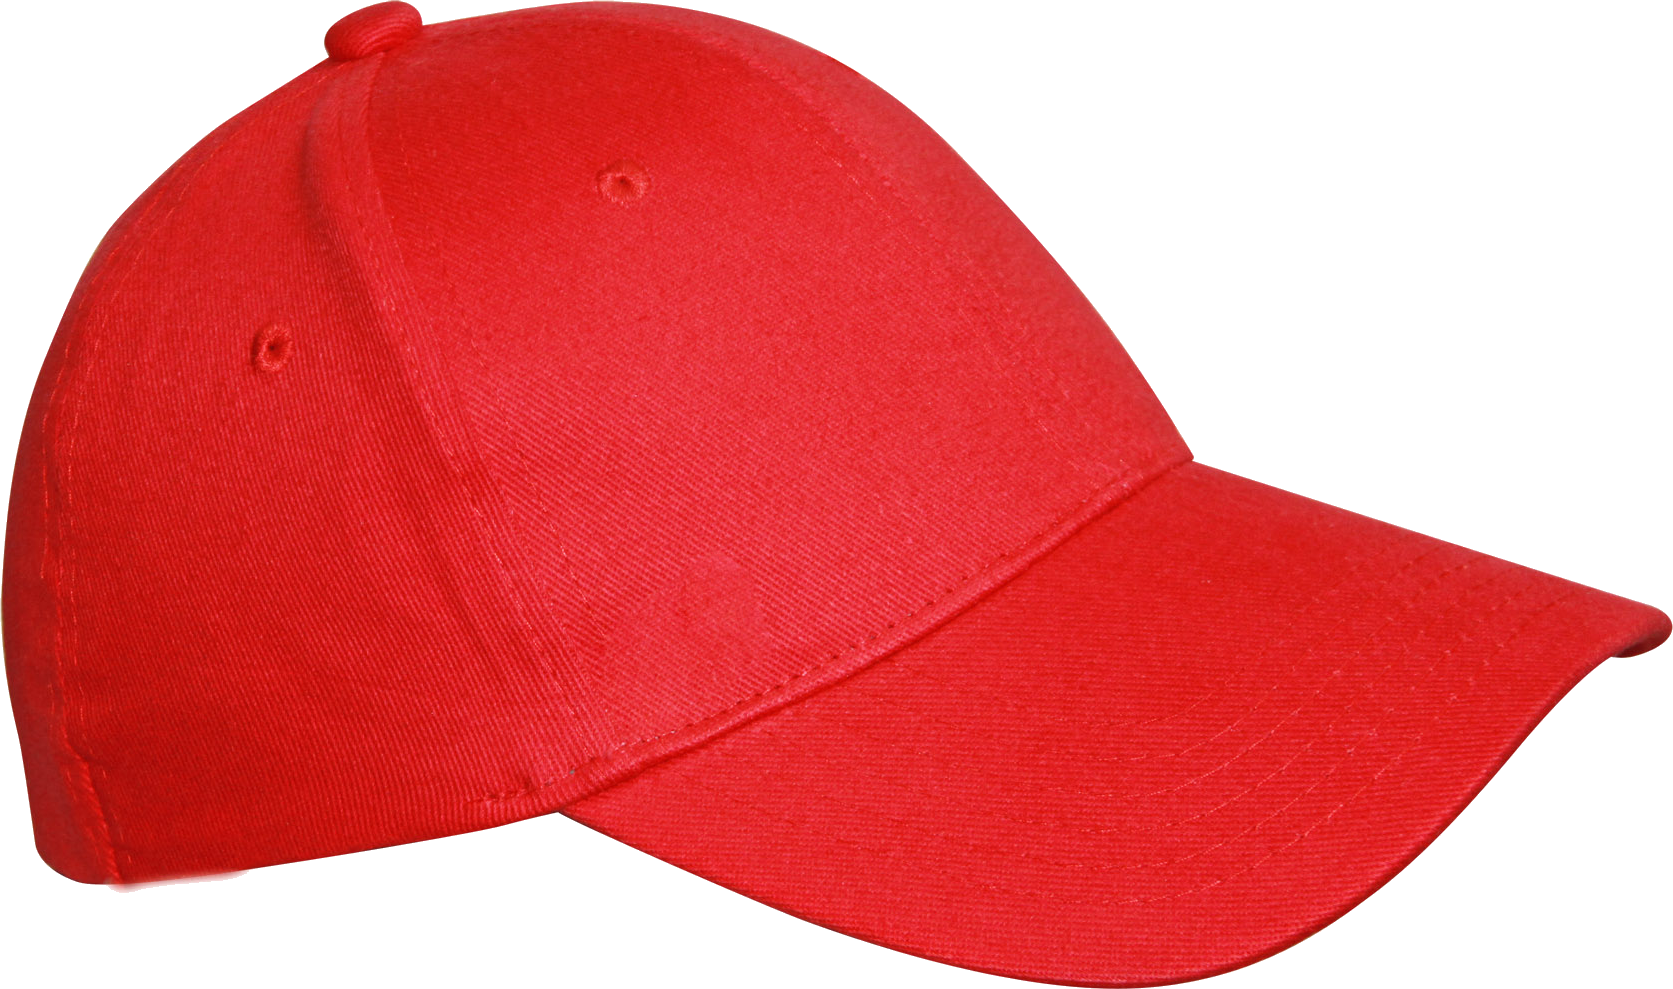 Baseball Cap PNG - 11360